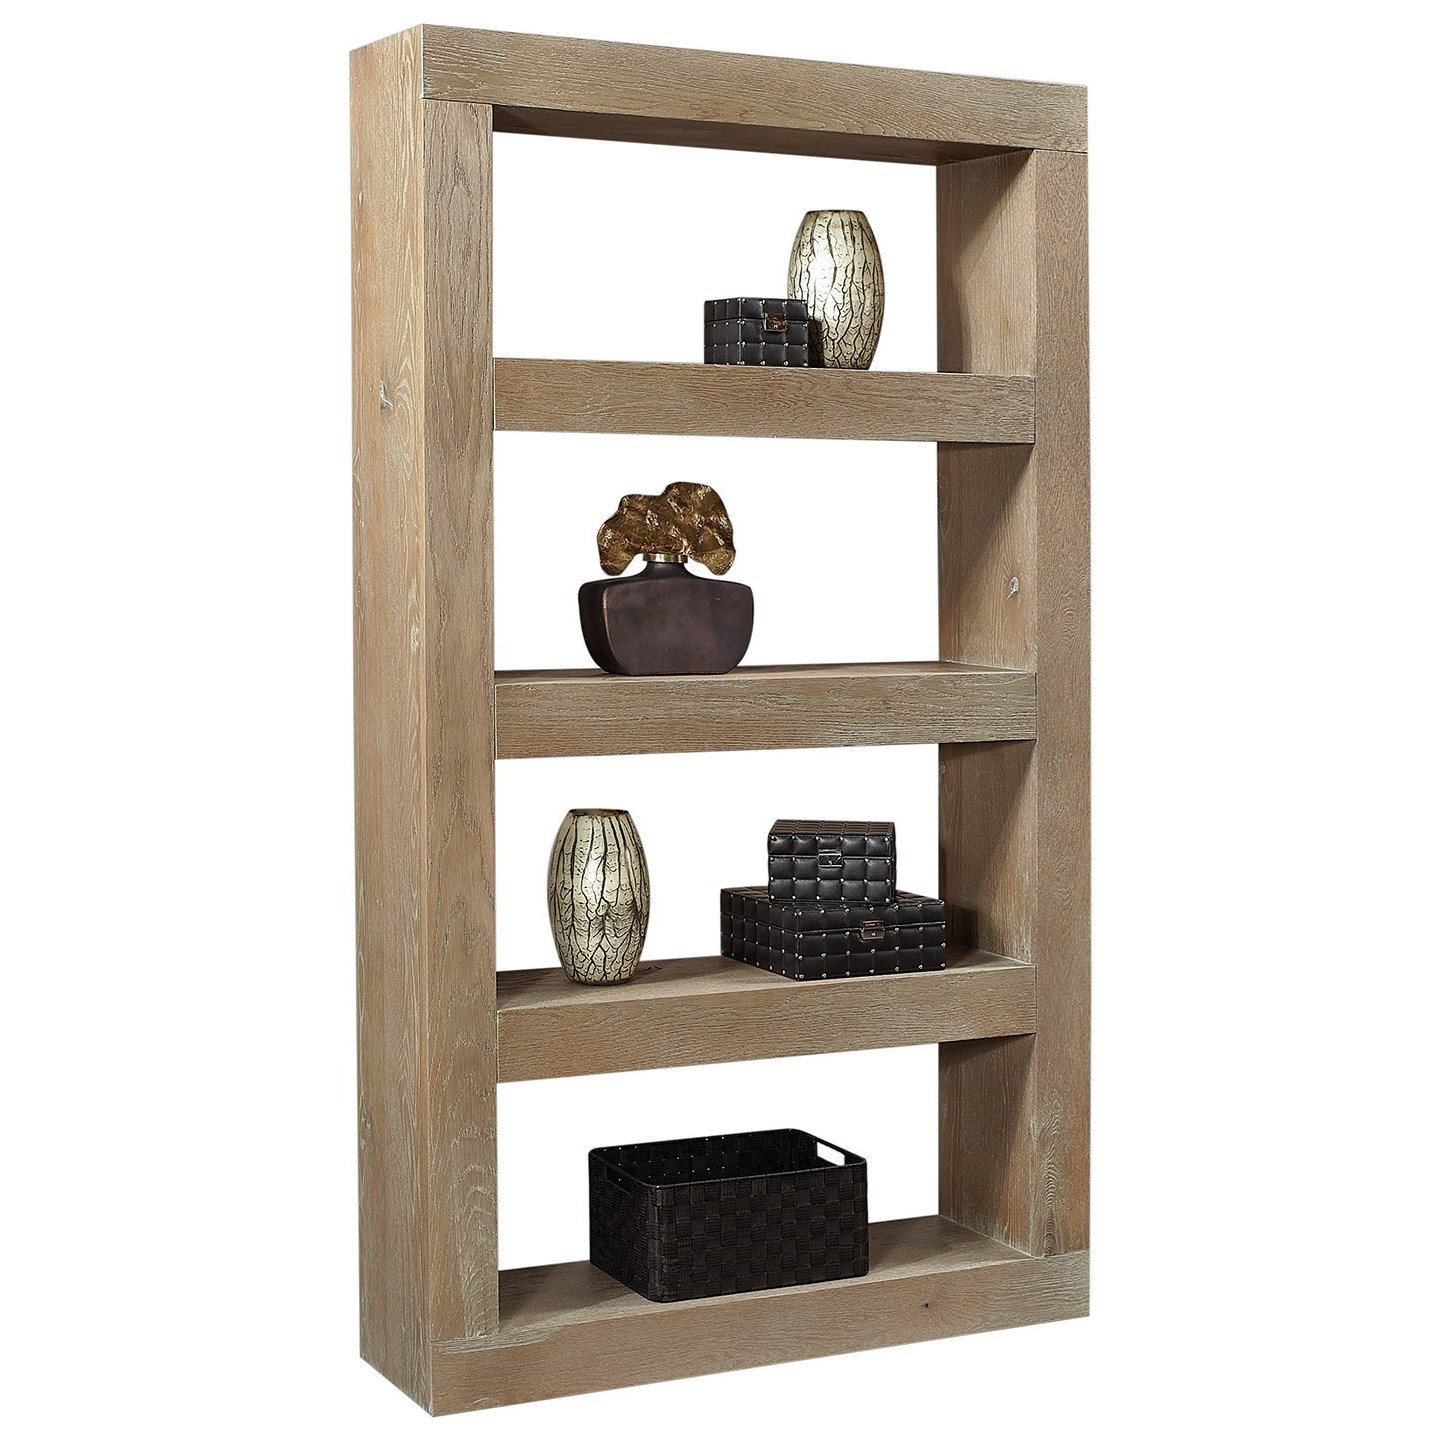 Nova Oak Open Display Case by Aspenhome at Walker's Furniture